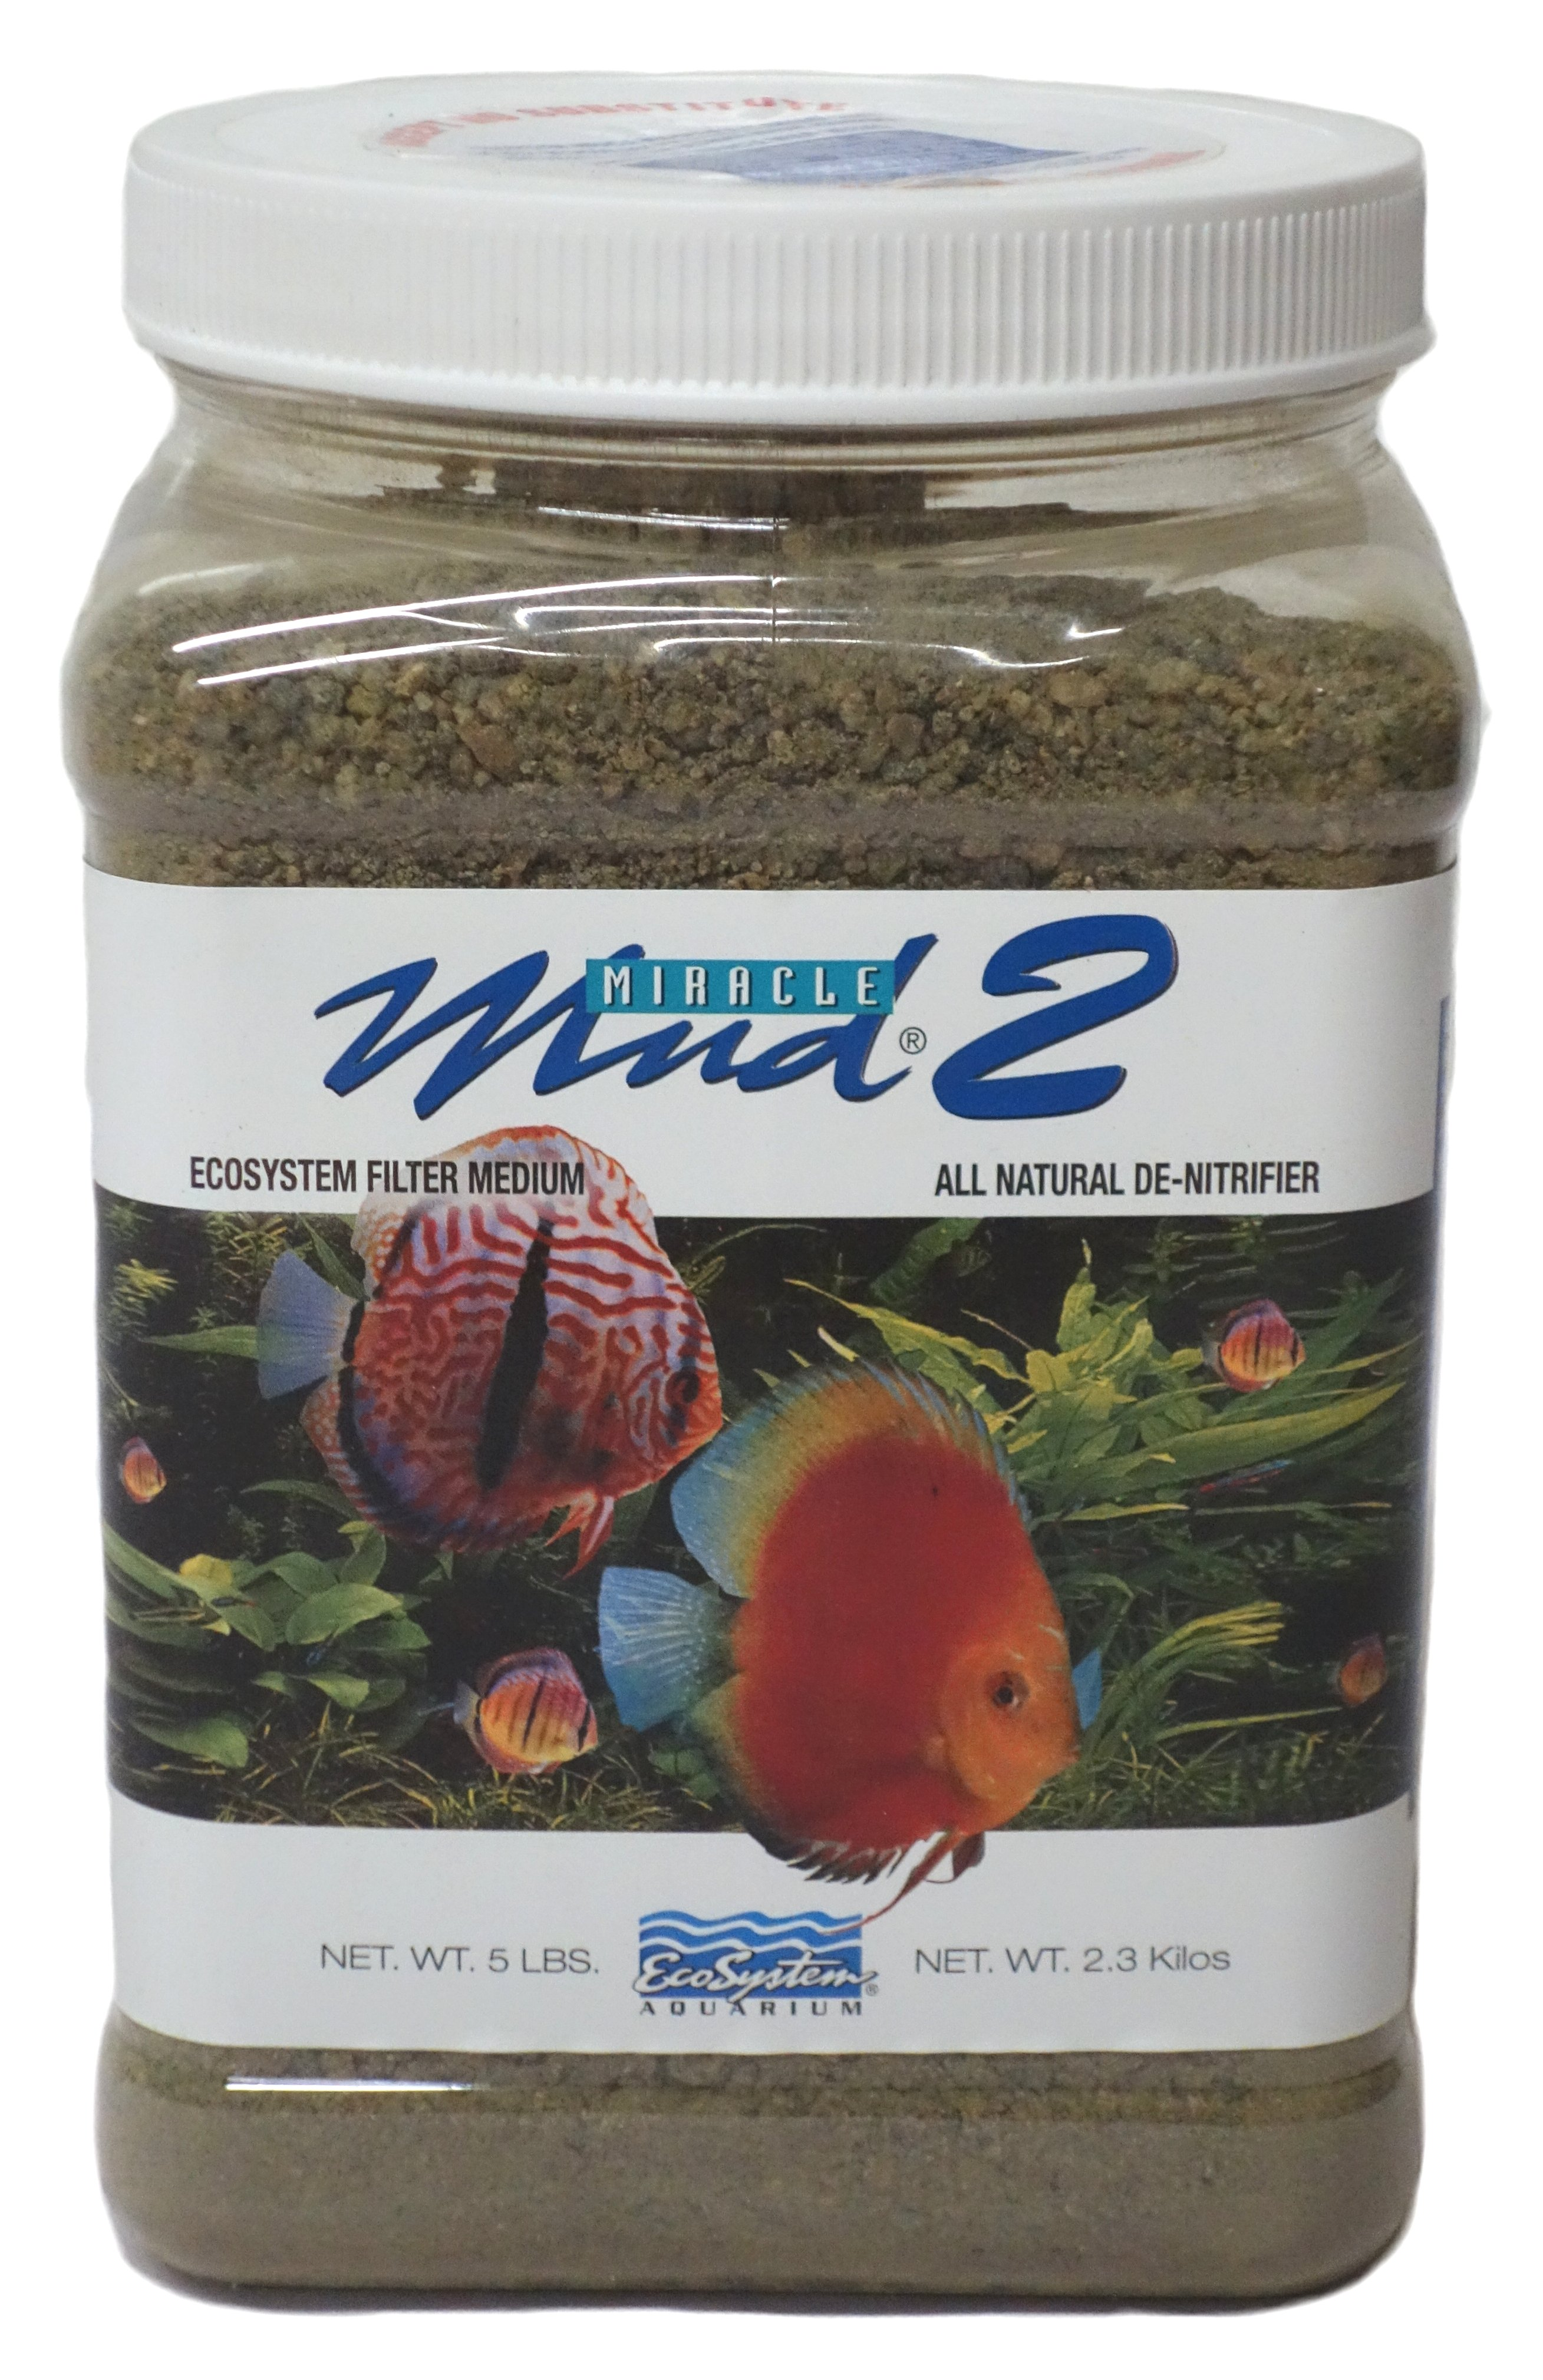 MIRACLE MUD 2, FRESHWATER 5 lb. by EcoSystem Aquarium